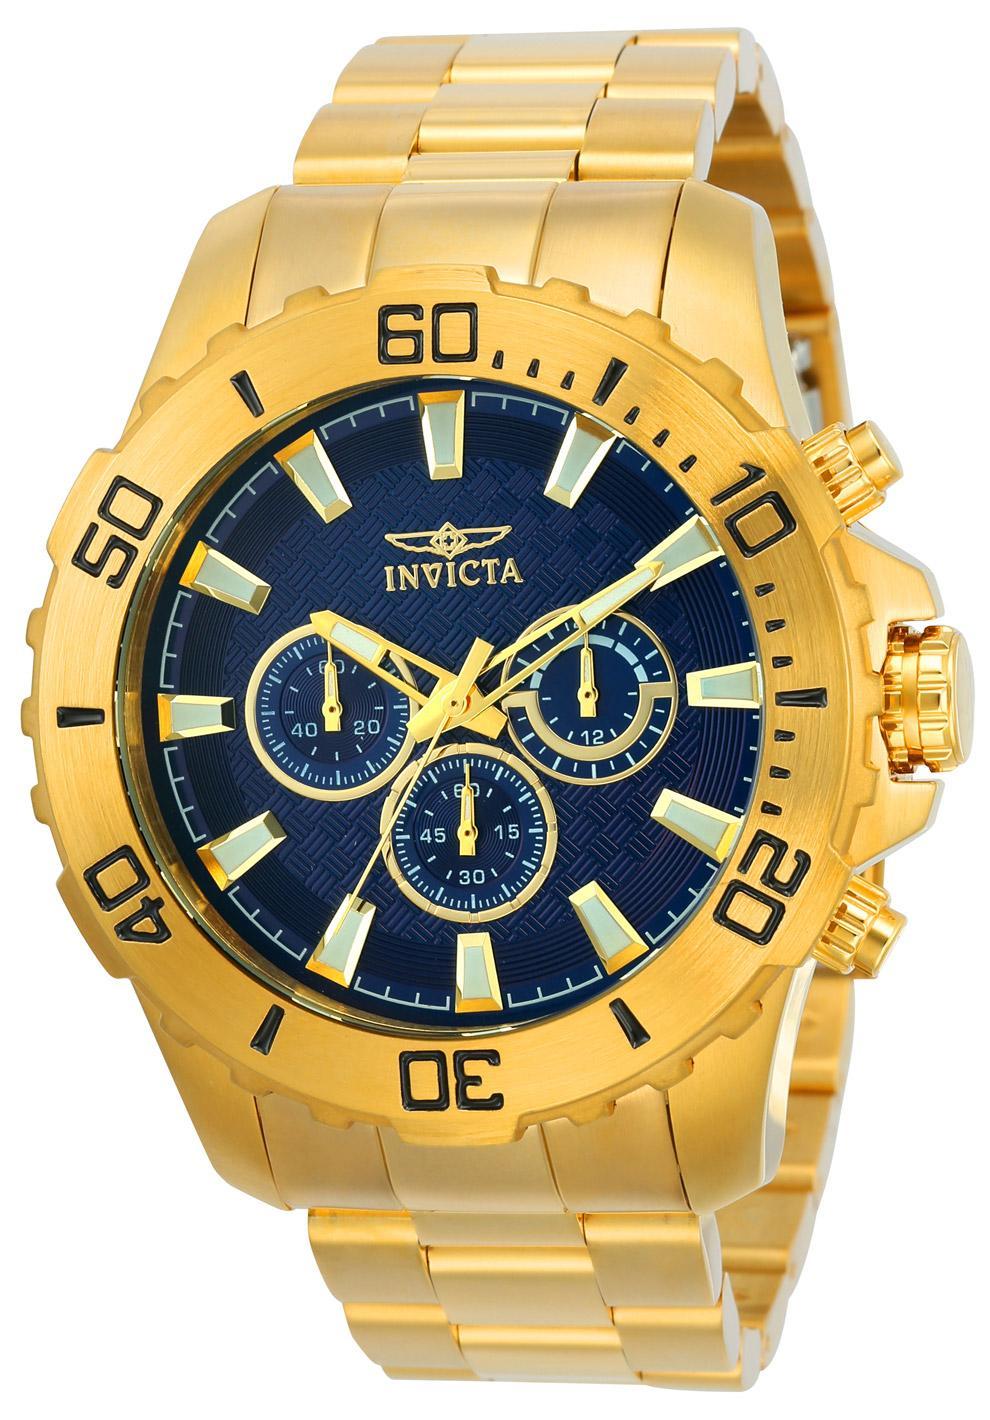 Relógio Masculino Invicta Pro Diver 22544 50mm Dourado (Cor interna da Caixa Azul)